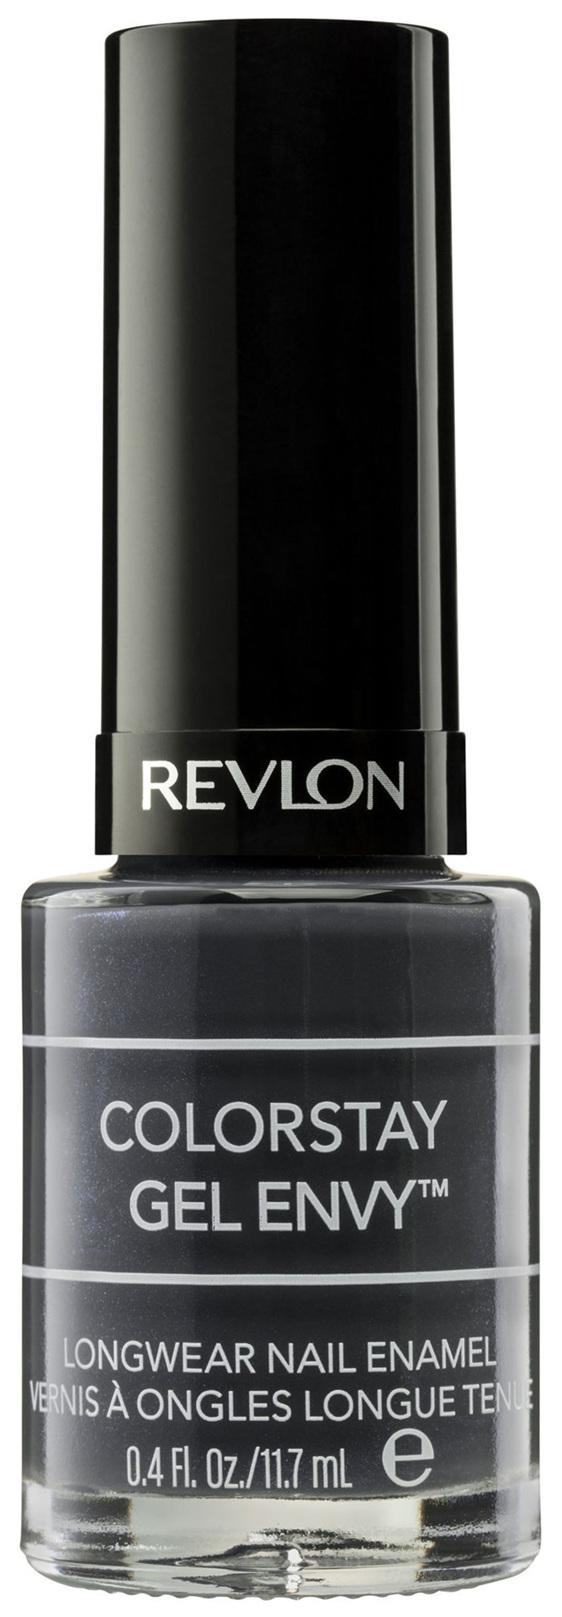 Revlon Colorstay Gel Envy™ Nail Enamel Ace Of Spades